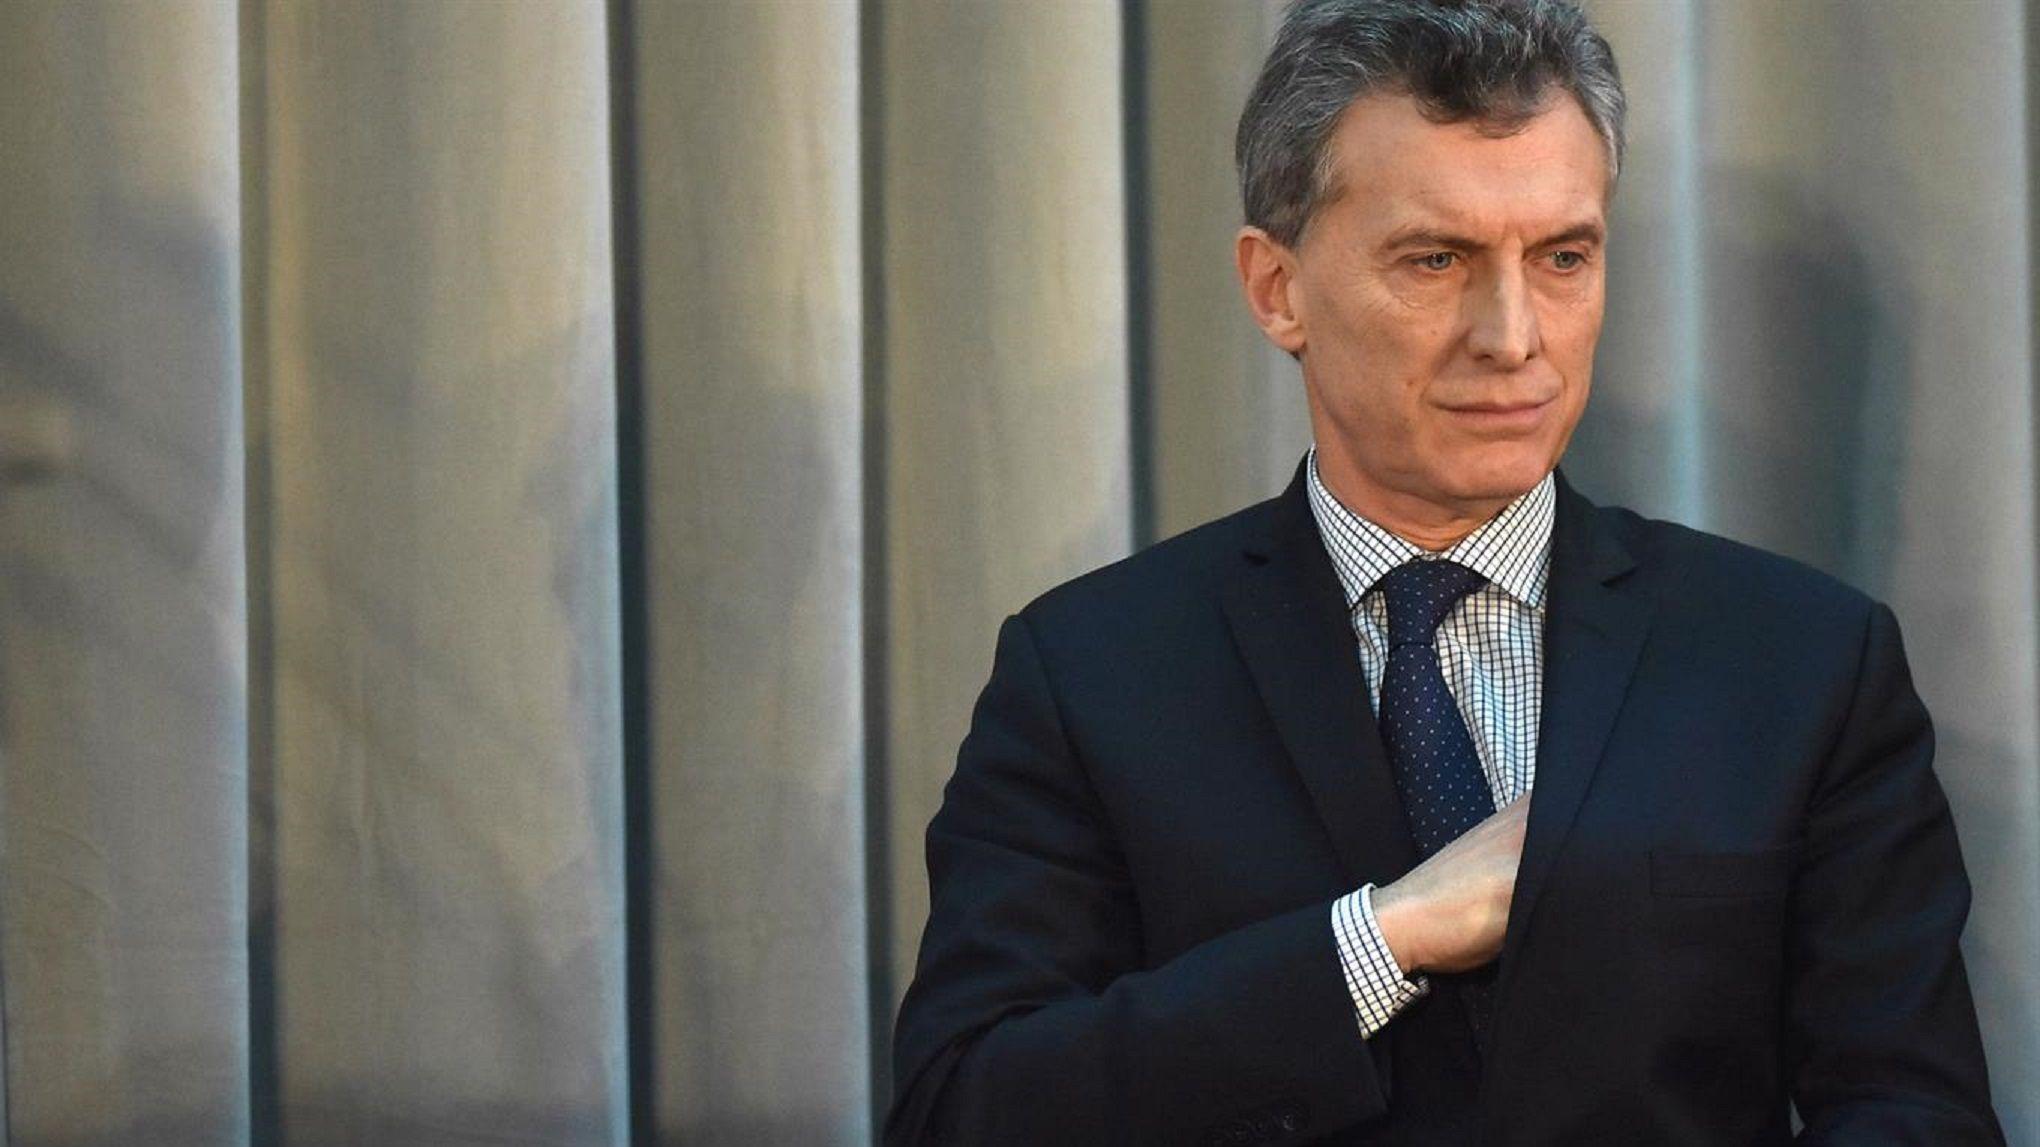 Detuvieron a un hombre que amenazó por teléfono a Macri